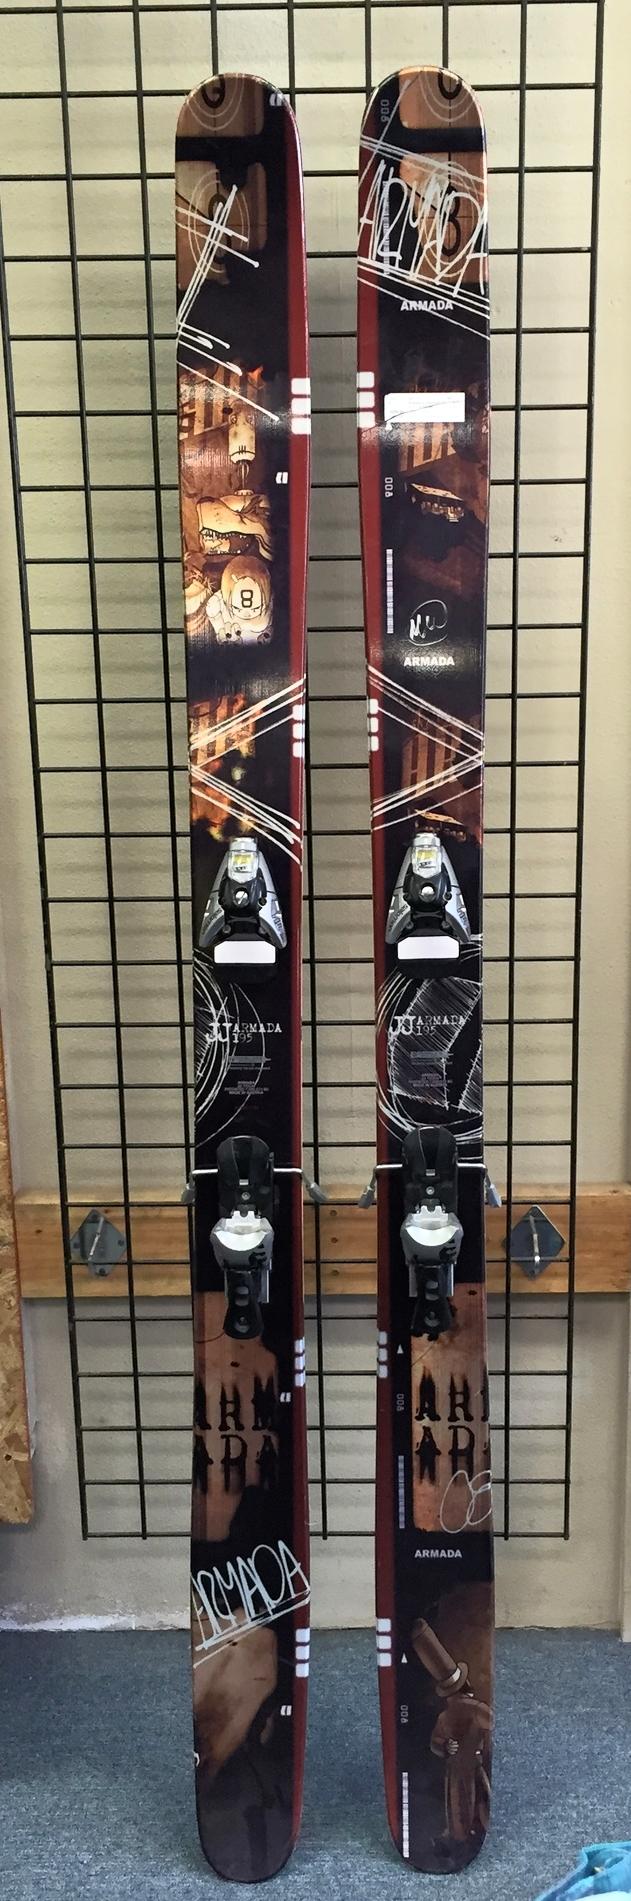 Armada Ski 195 + Salomon Bindings - $479.20